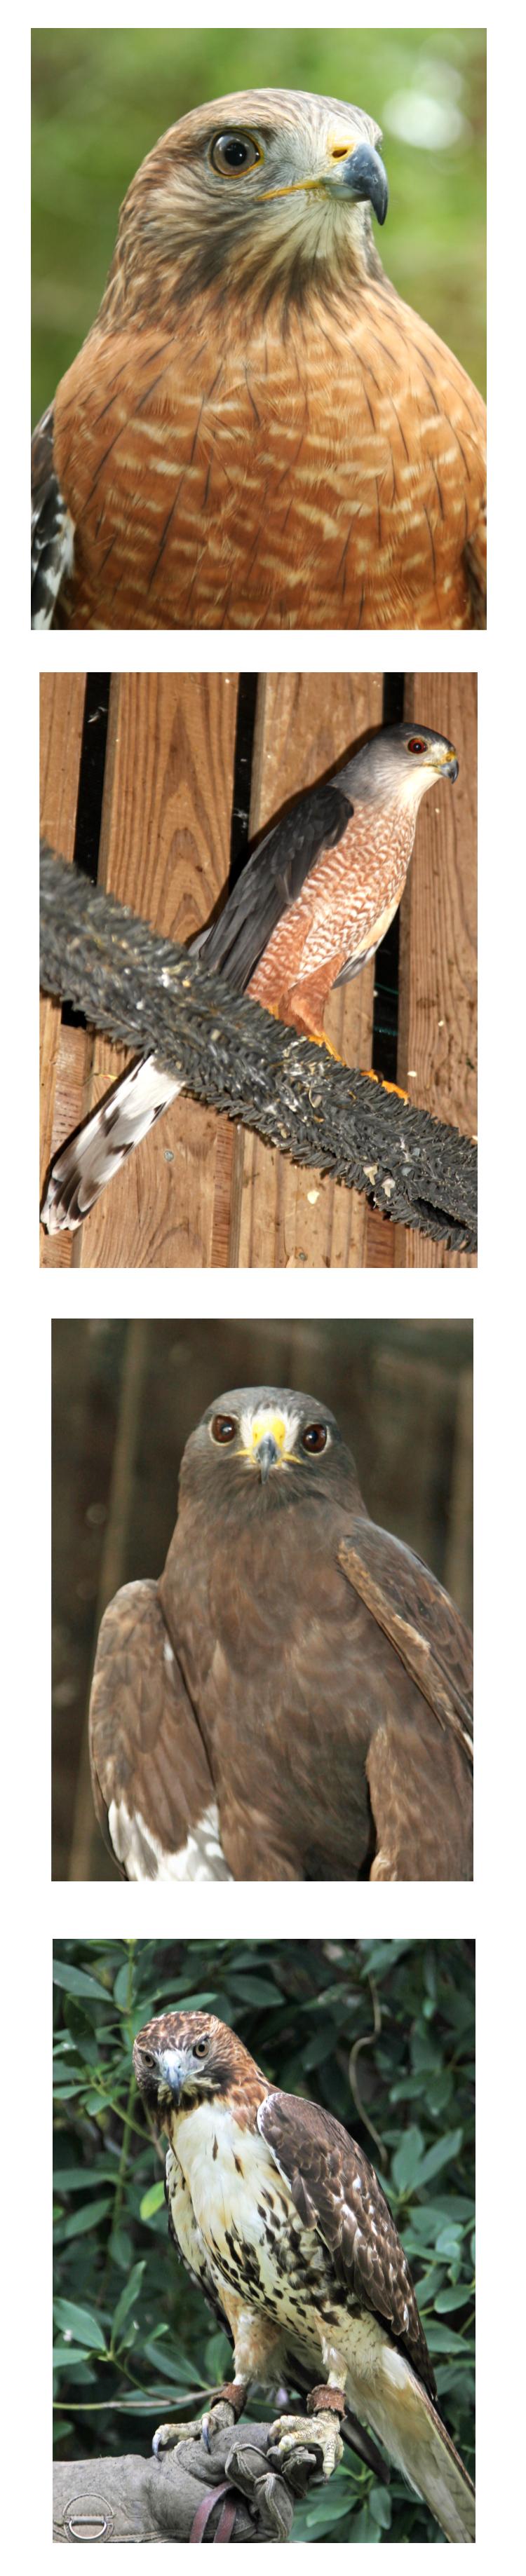 photos of hawks